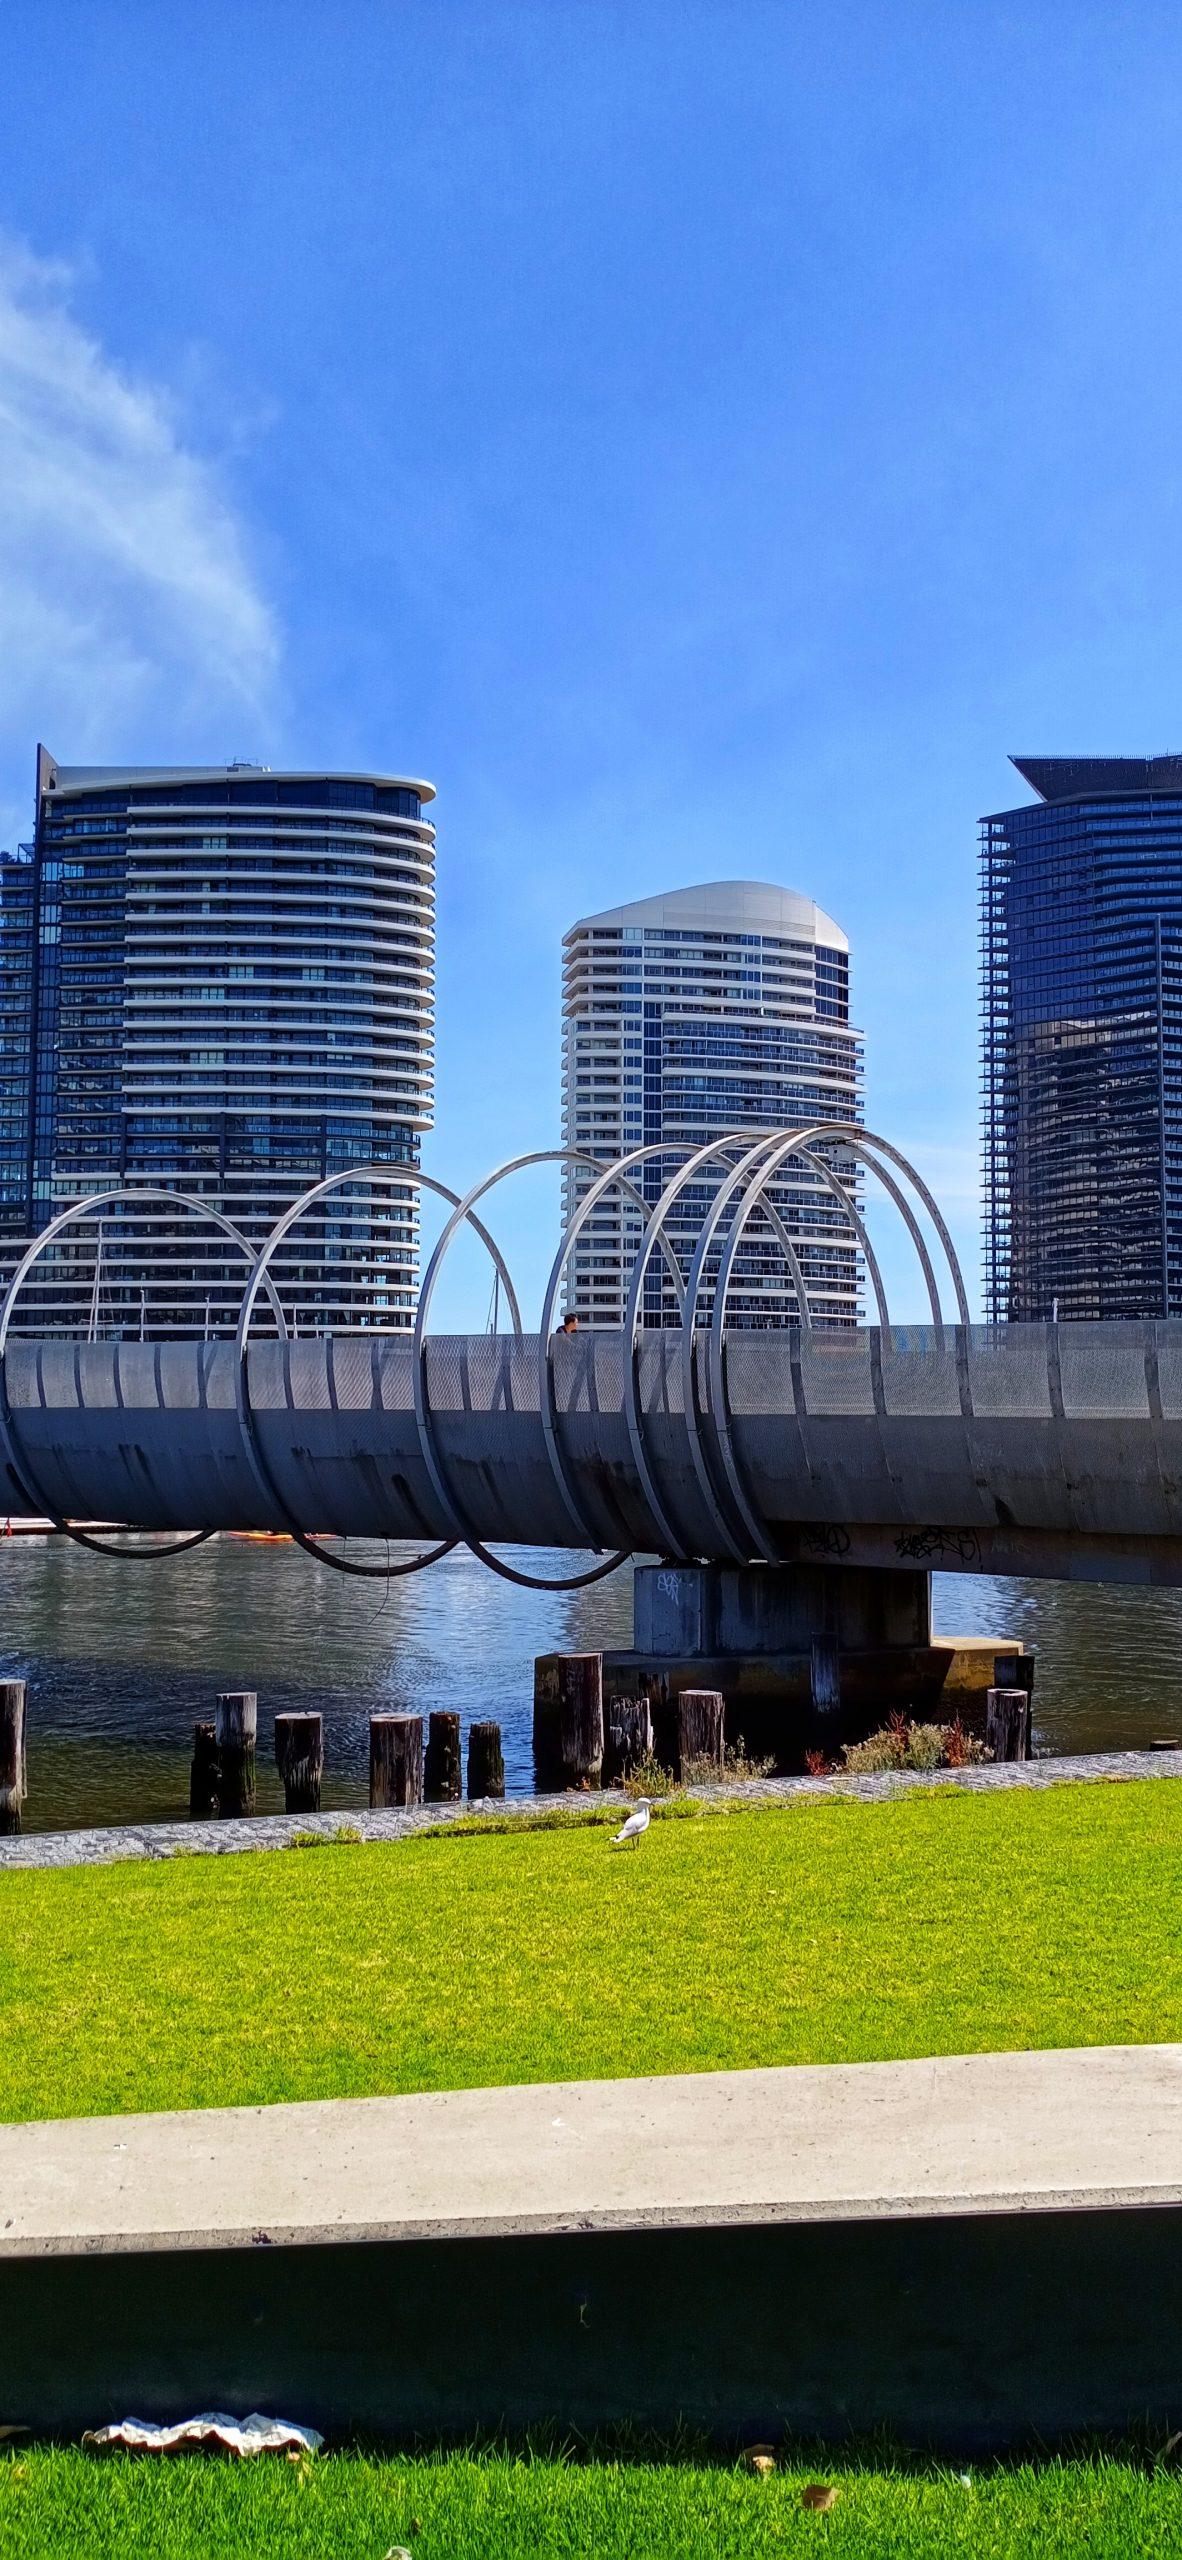 Buildings in Australia